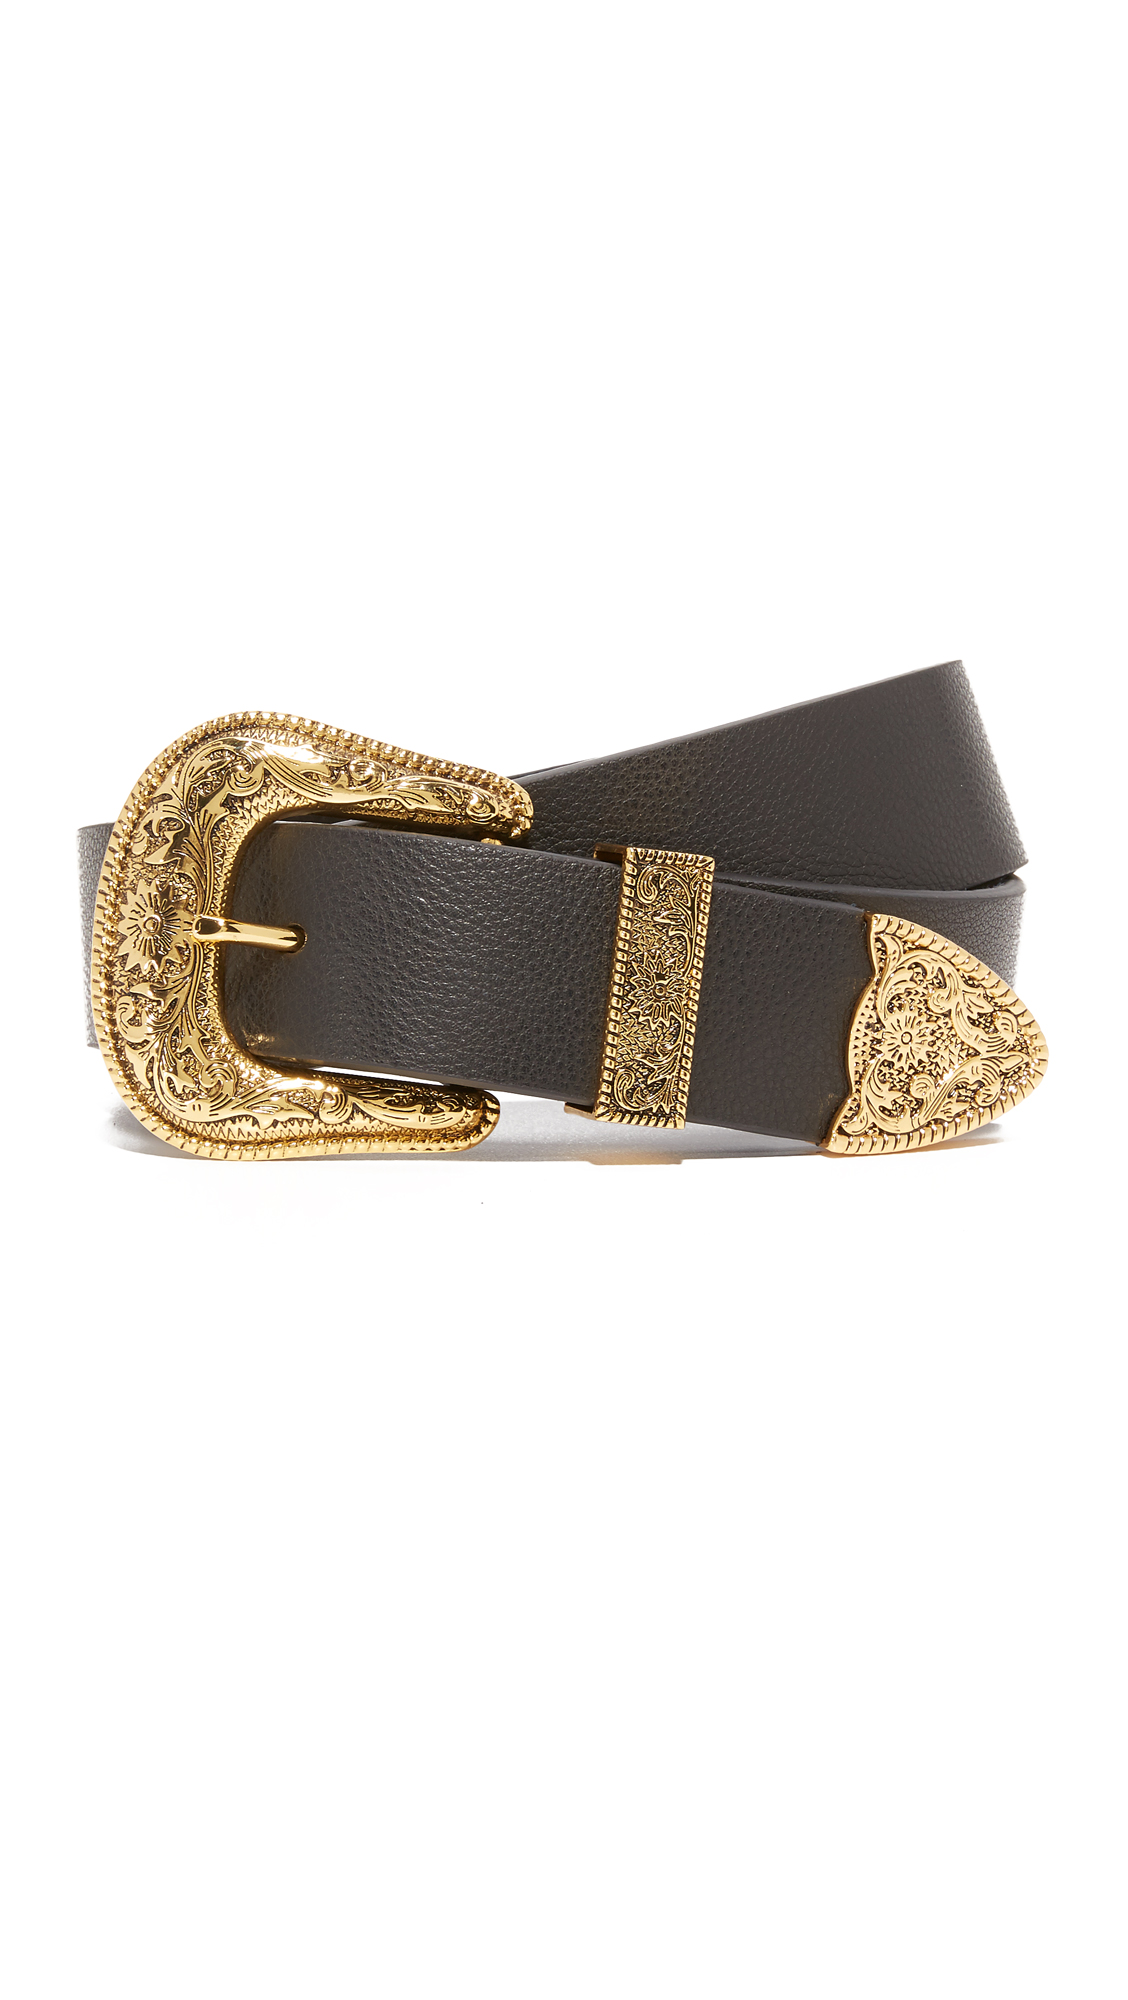 B-Low The Belt Frank Belt - Black